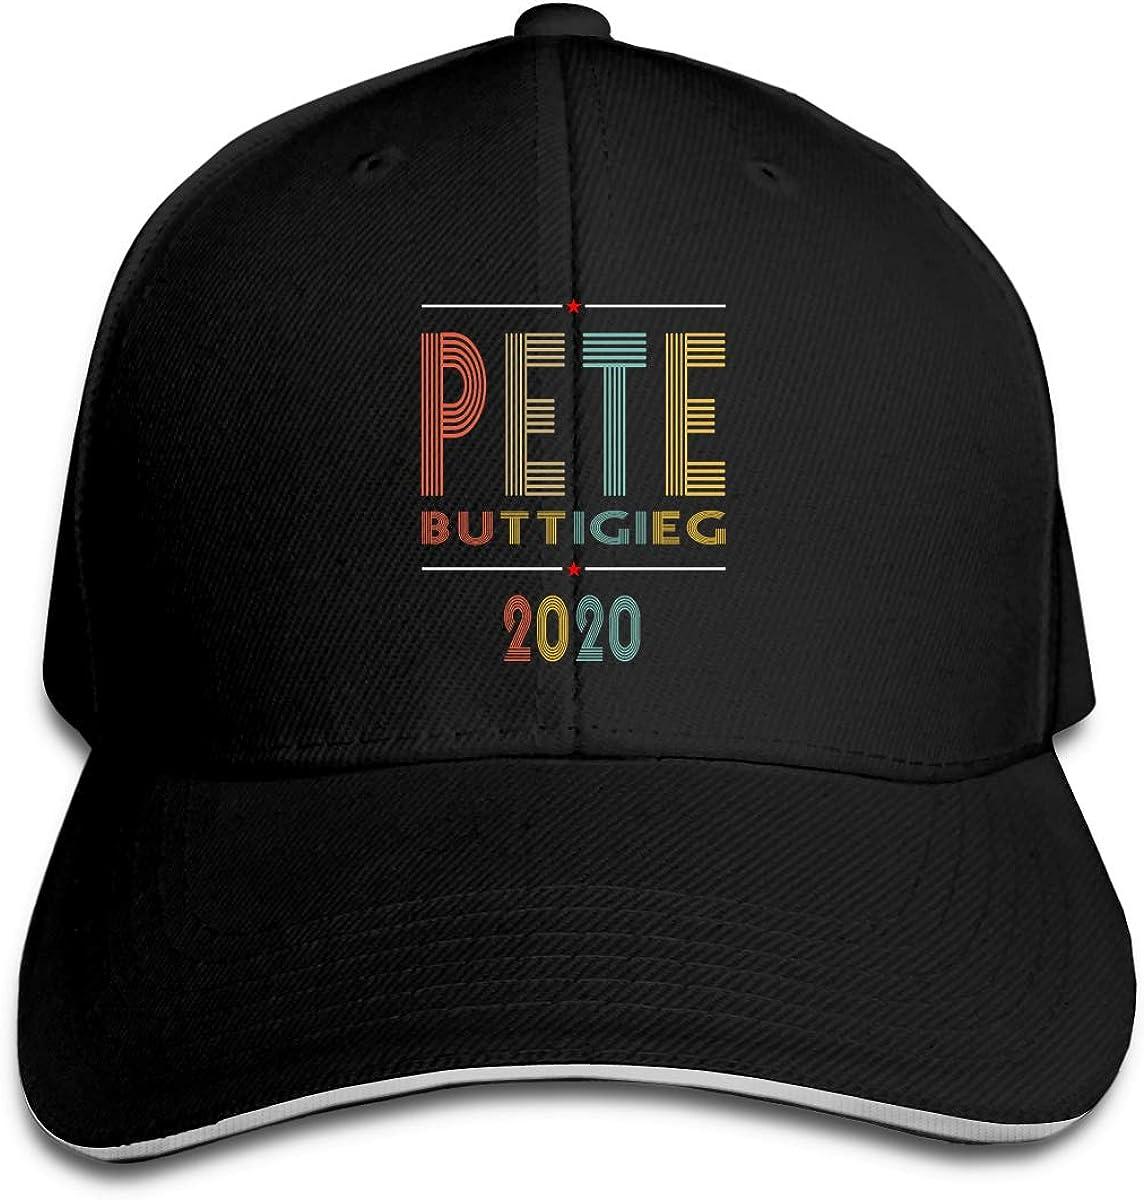 NCEUANCE Mayor Pete Buttigieg 2020 Caps Sports Trucker Caps Pattern Strapback Hat for Men//Women